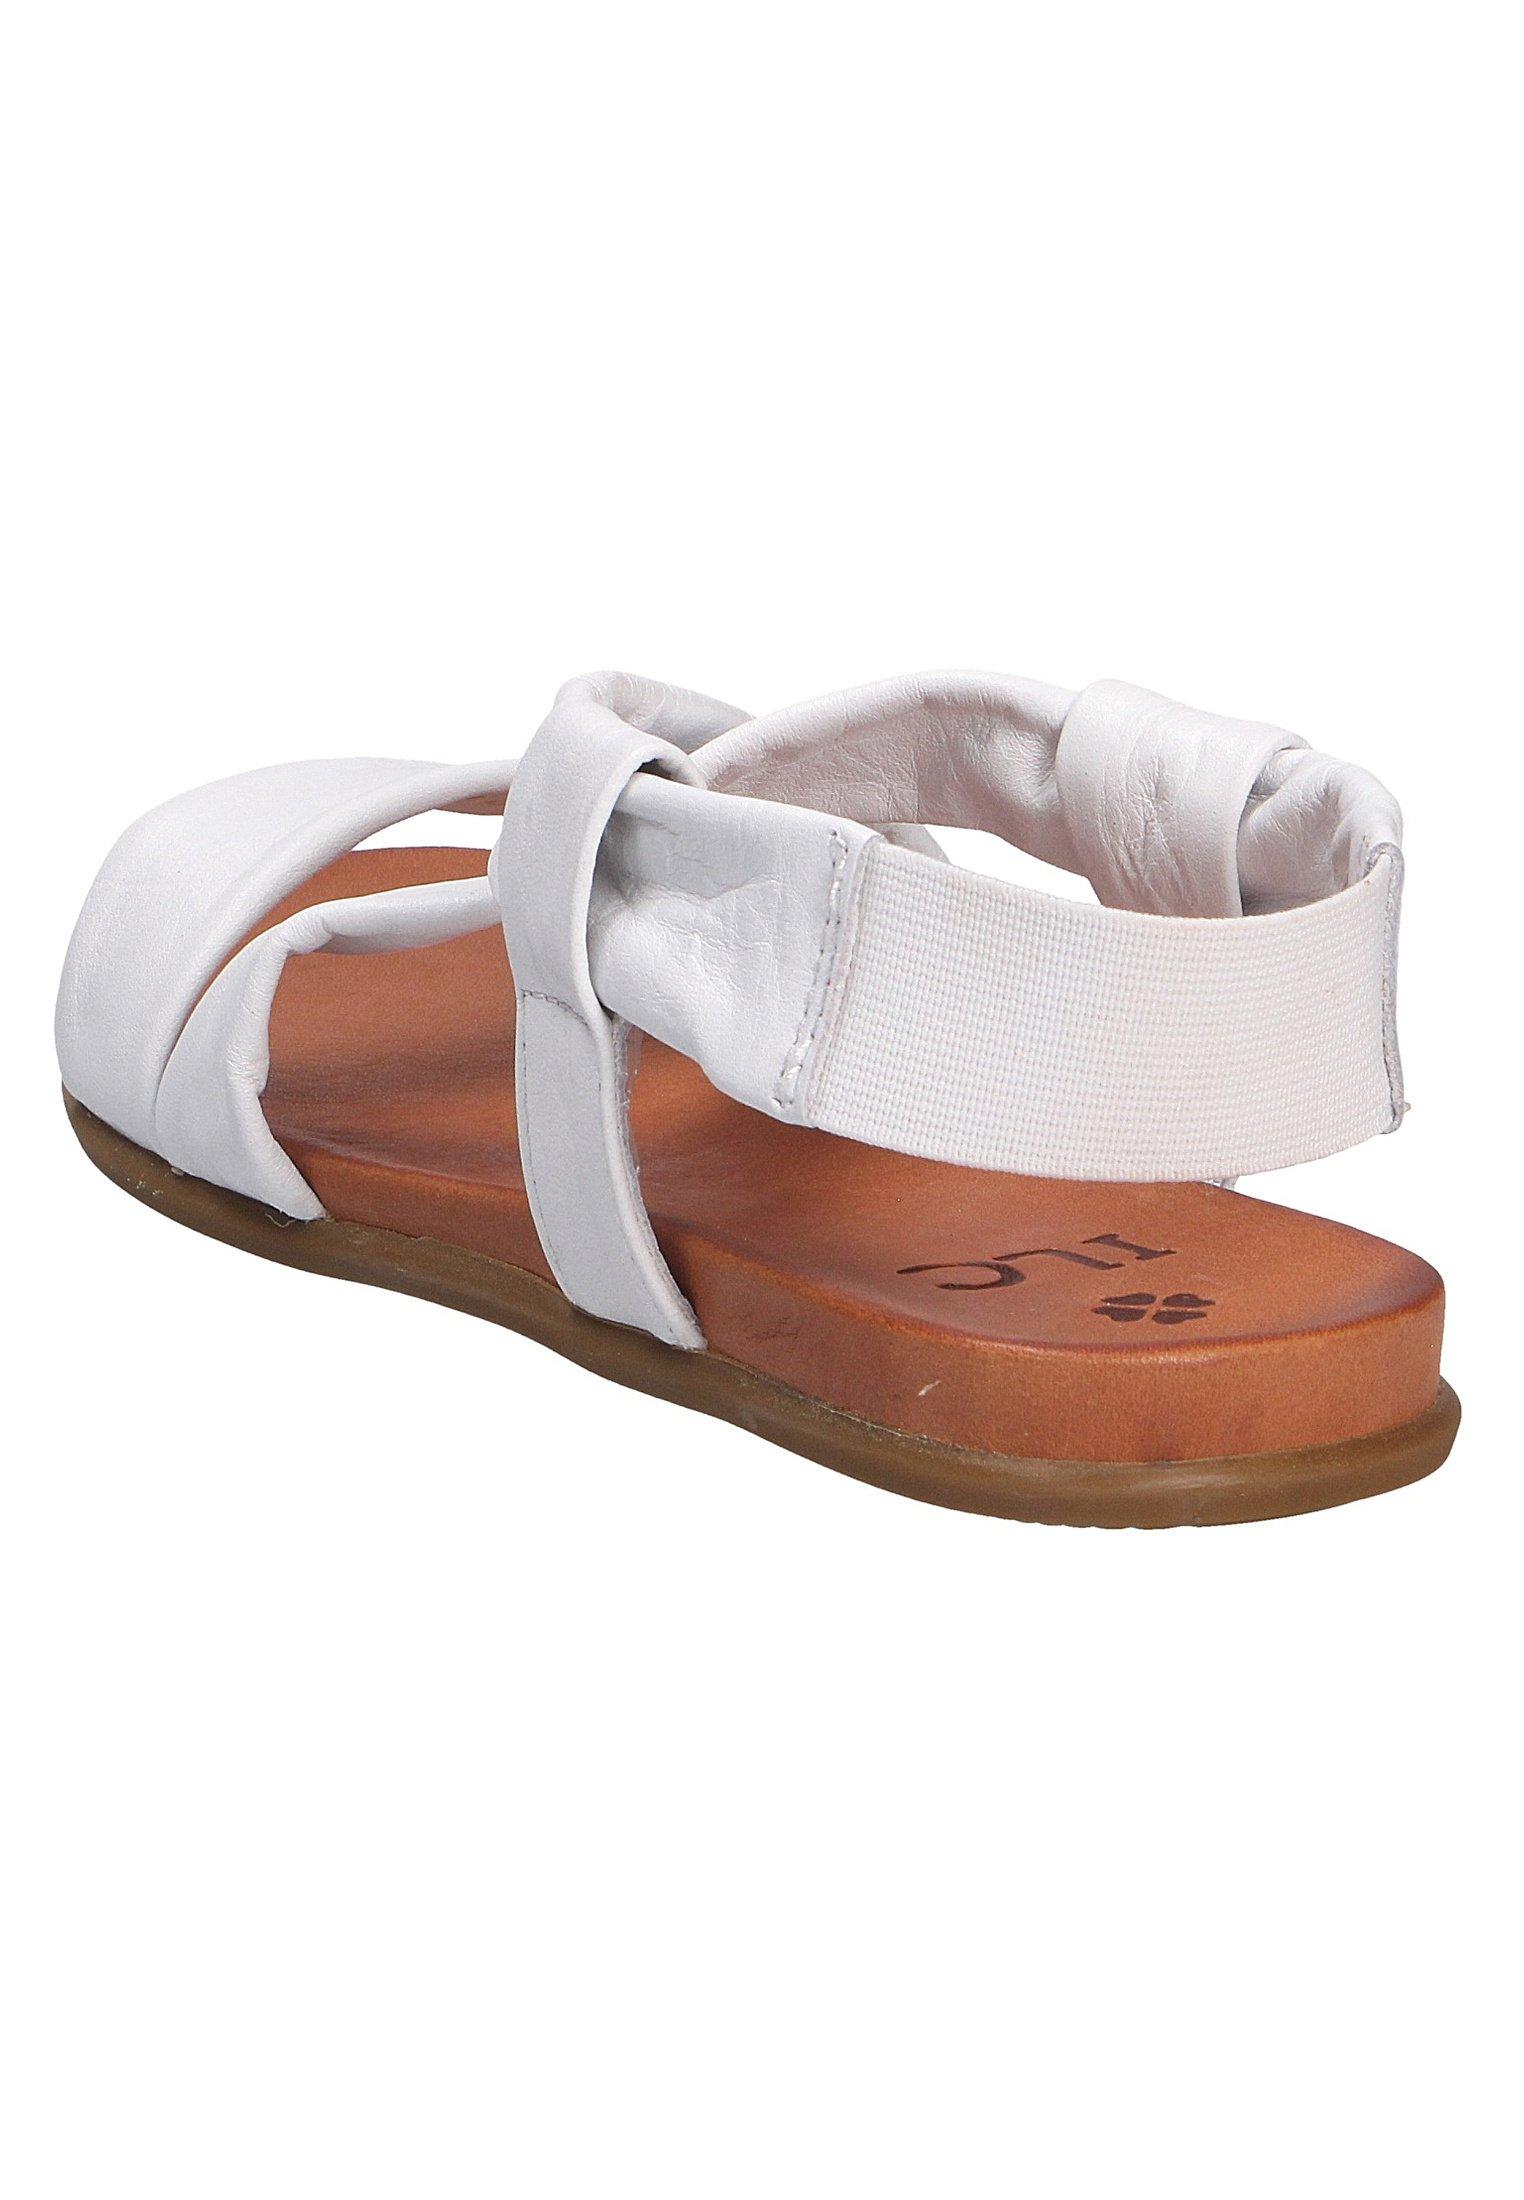 ILC ILC FASHION - Sandales - white